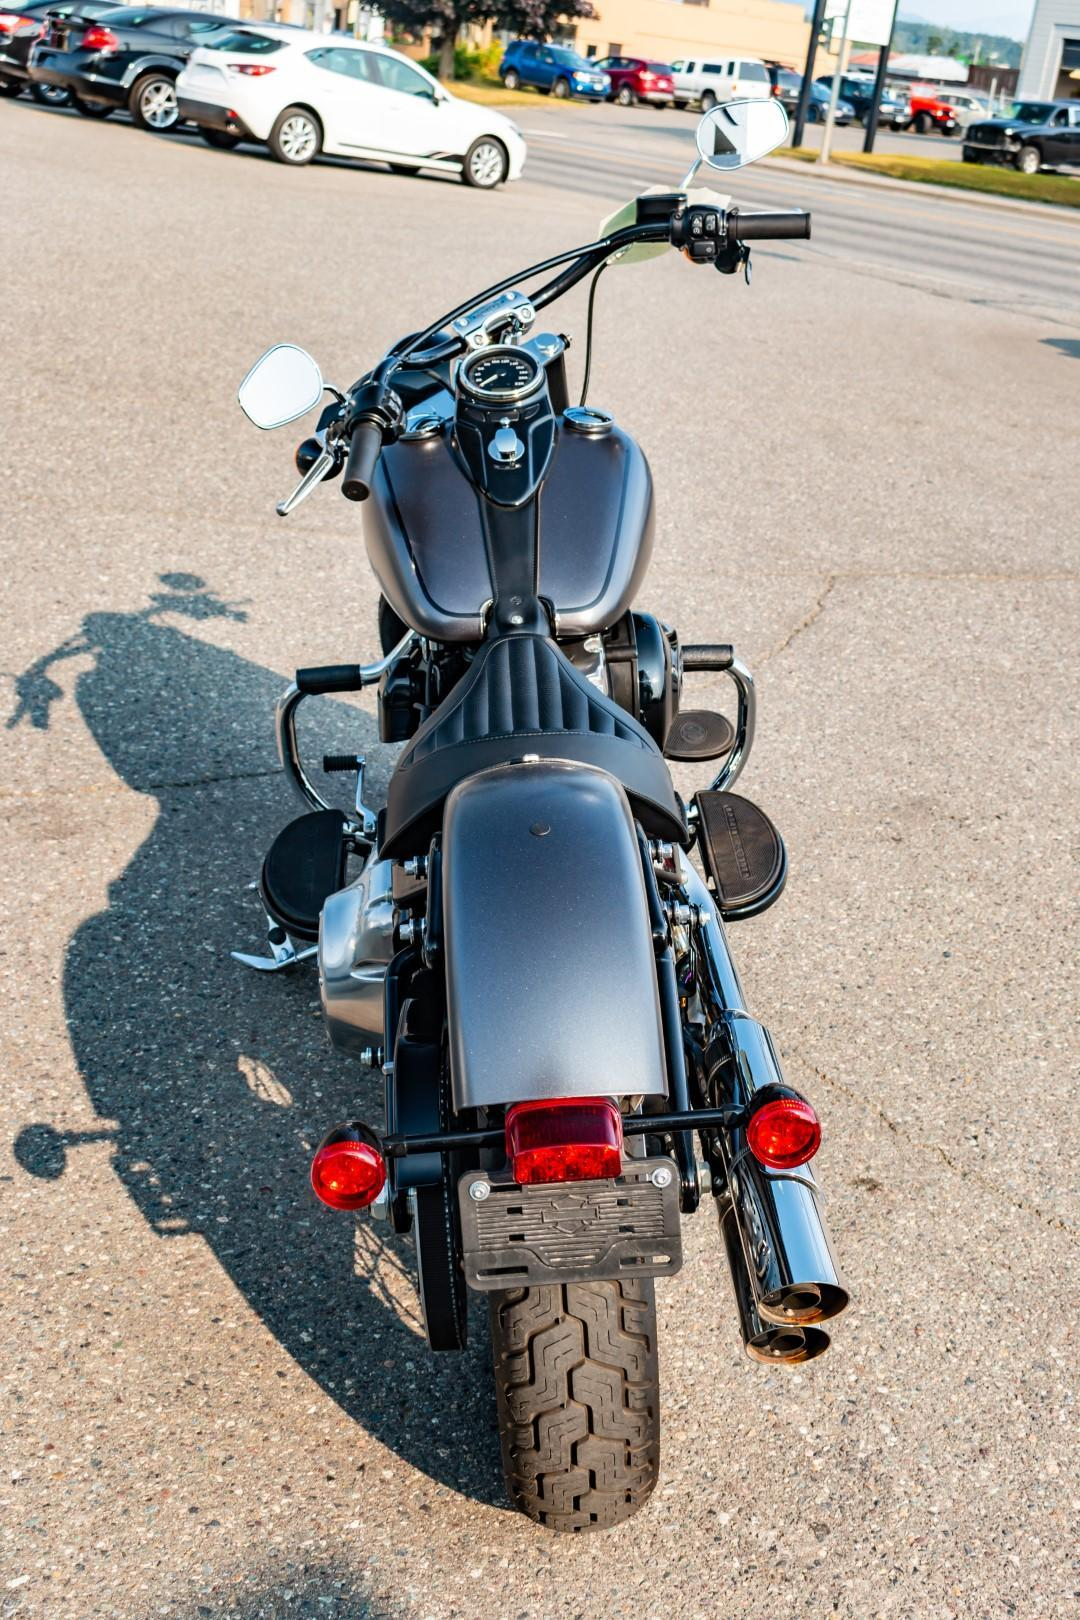 rear image